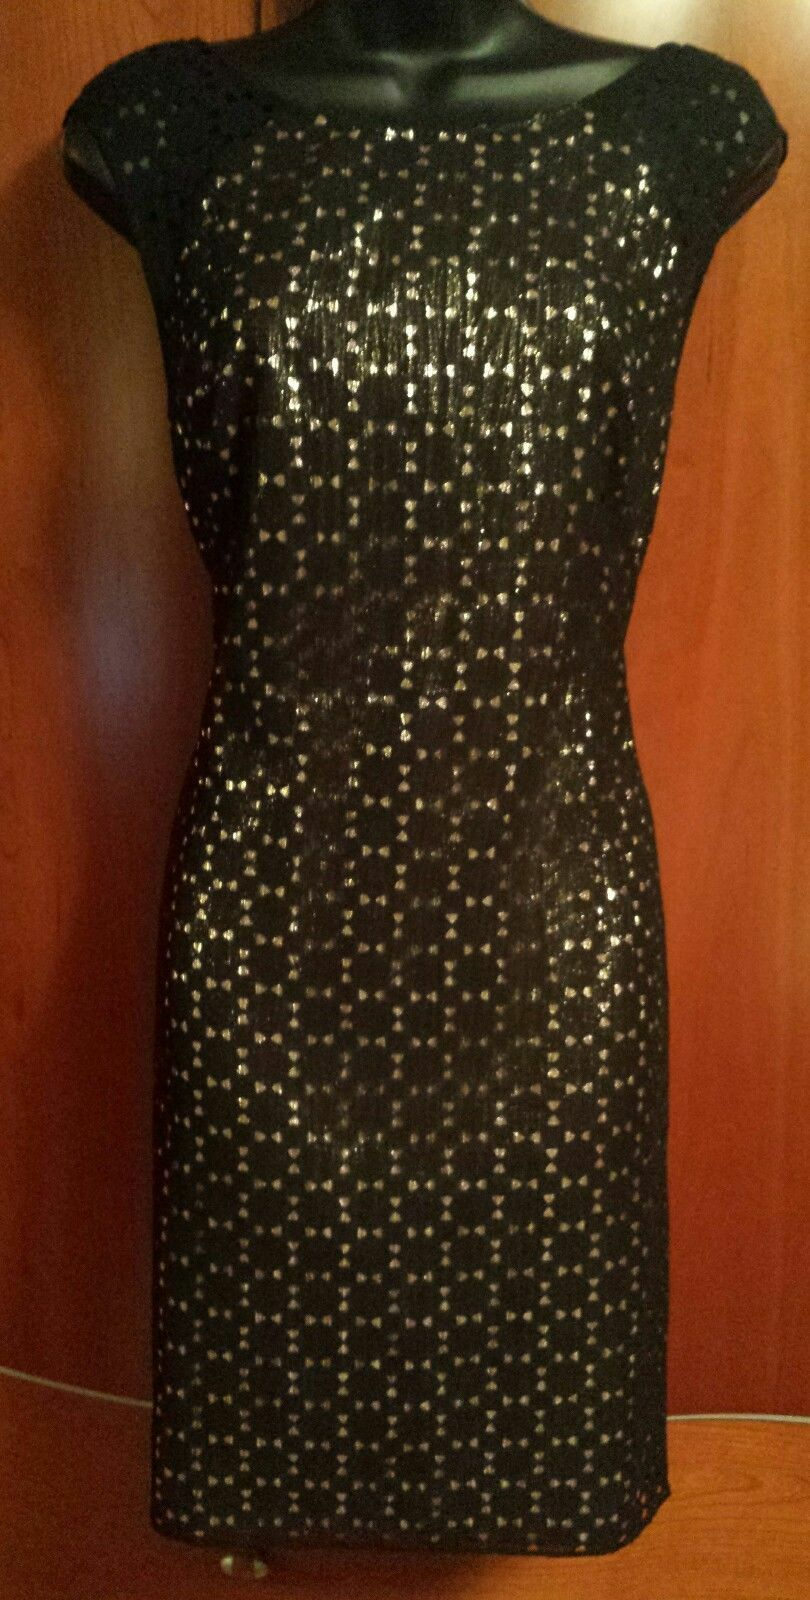 NWOT Phoebe Couture schwarz & Gold Sleeveless Dress Größe 6